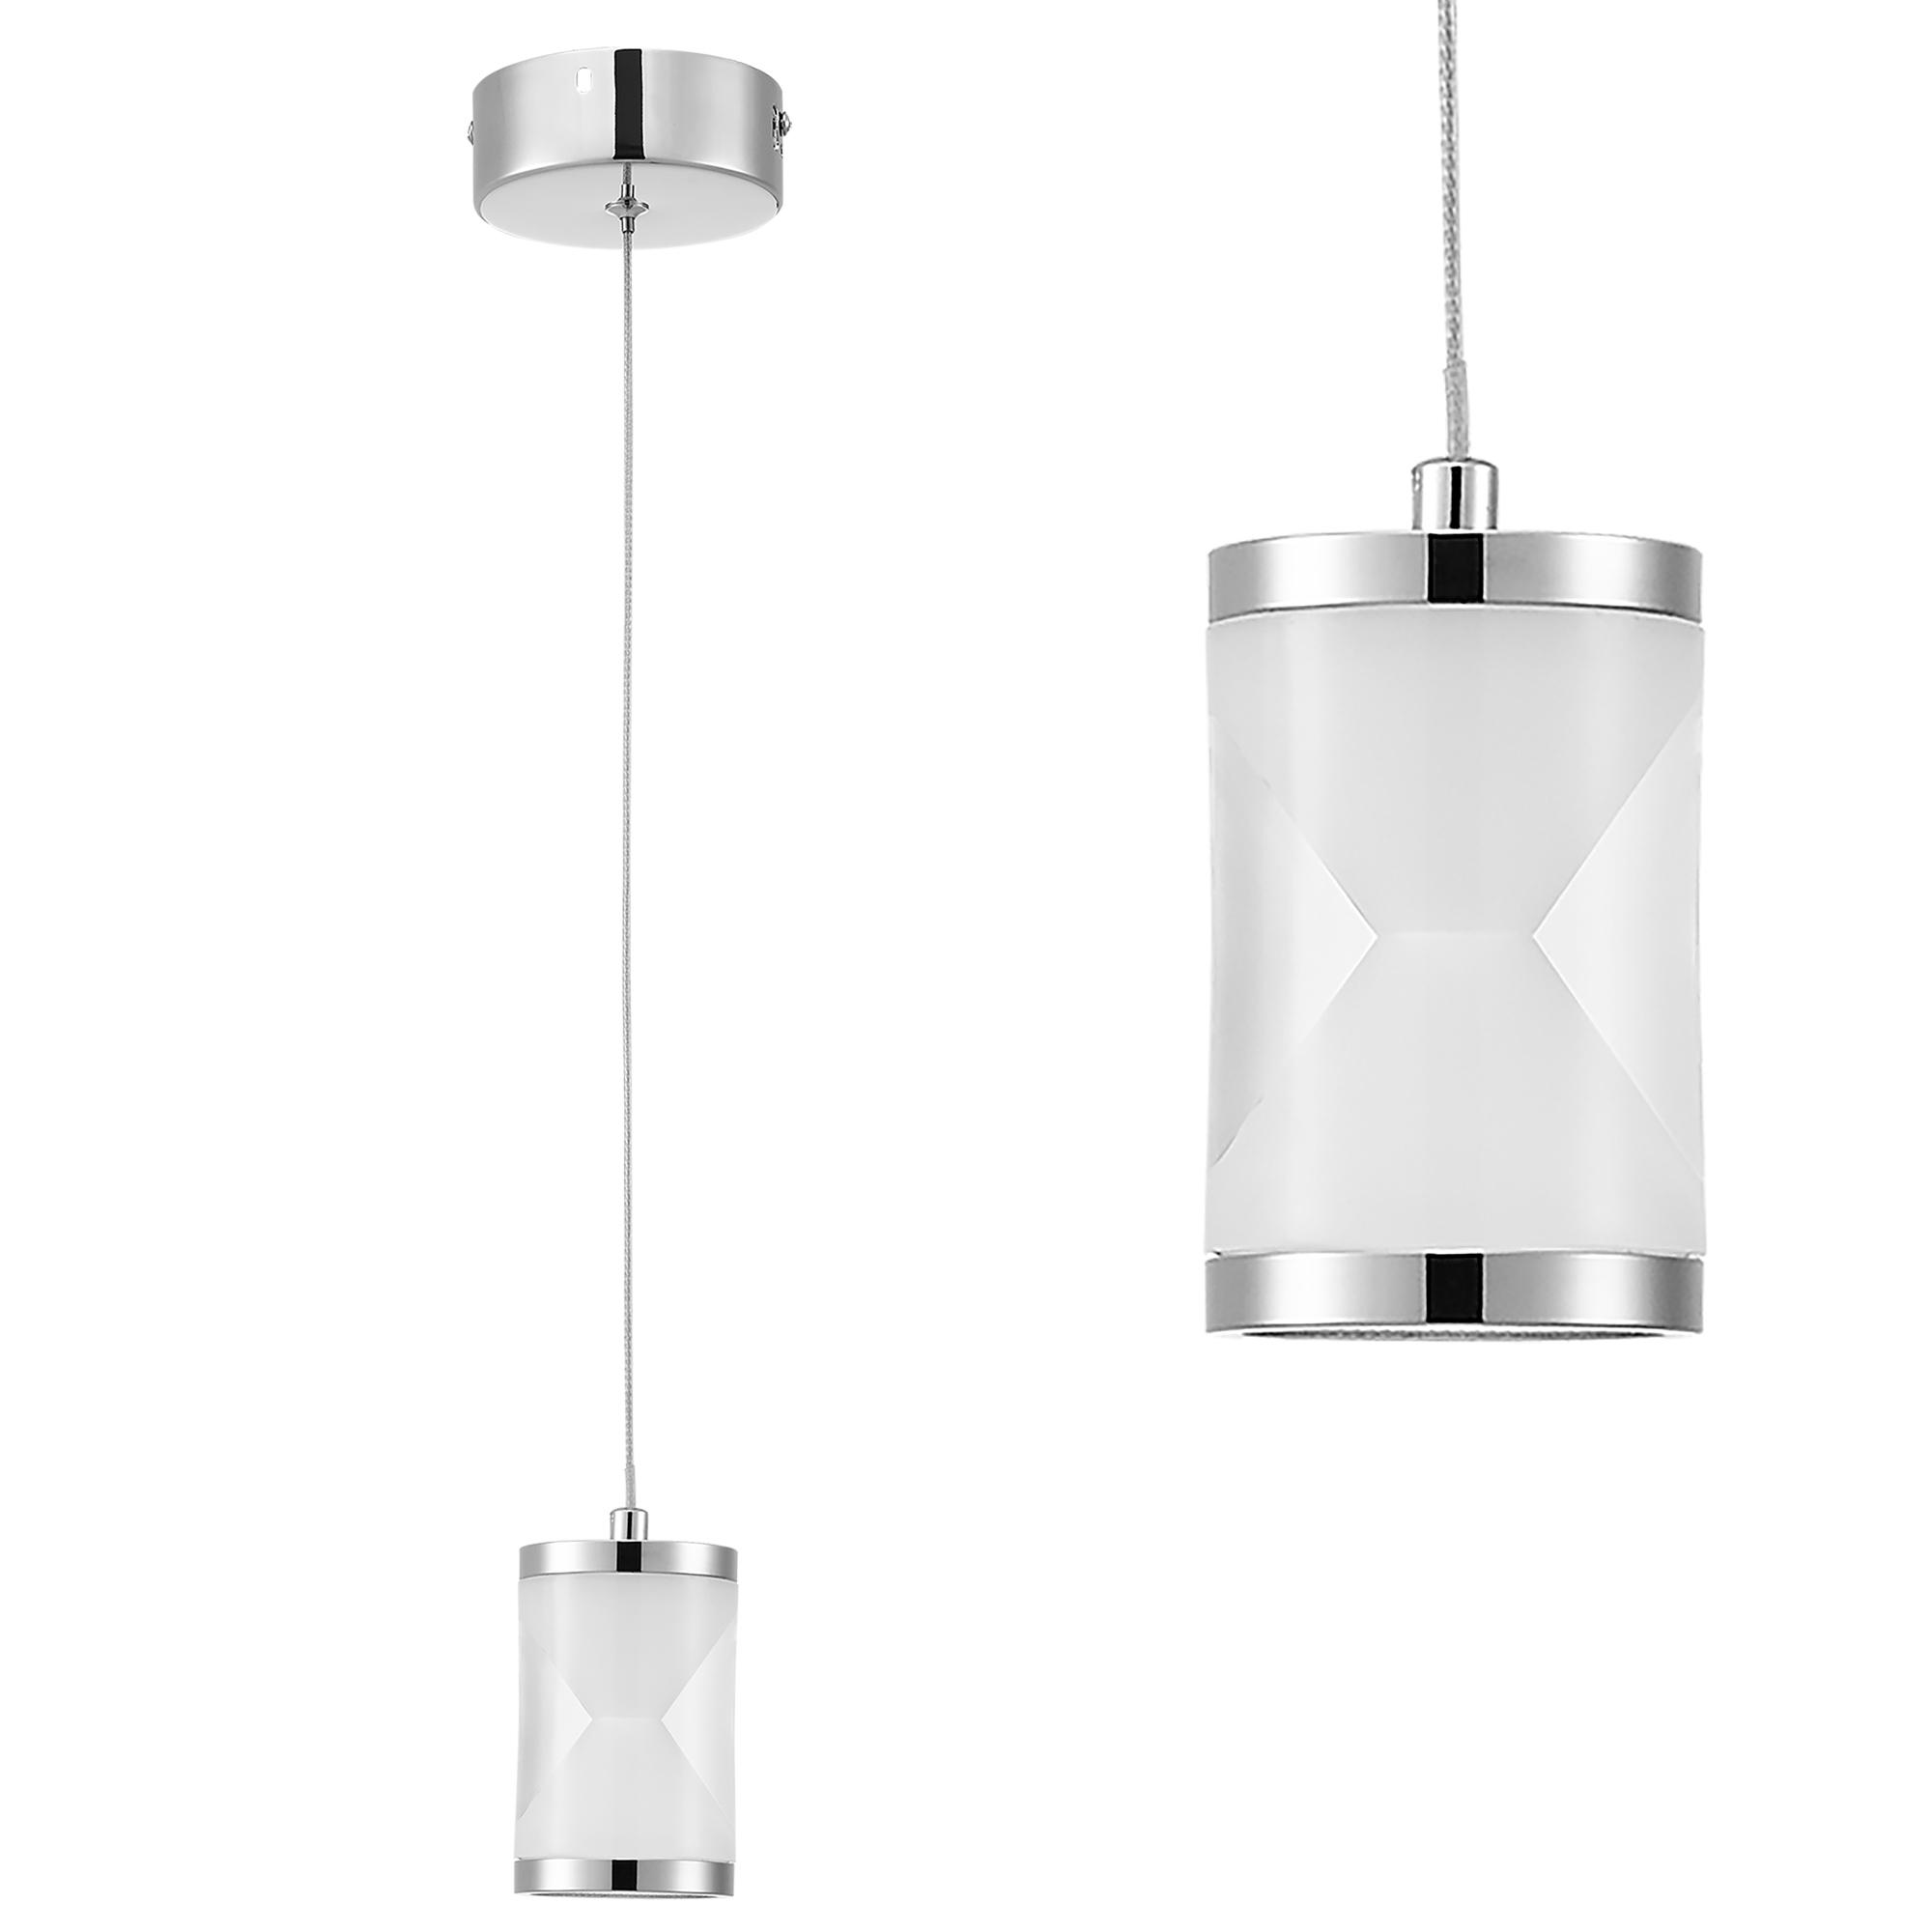 10x led e14 warmwei filament leuchtmittel 2700k 160lm 2w kerze ebay. Black Bedroom Furniture Sets. Home Design Ideas